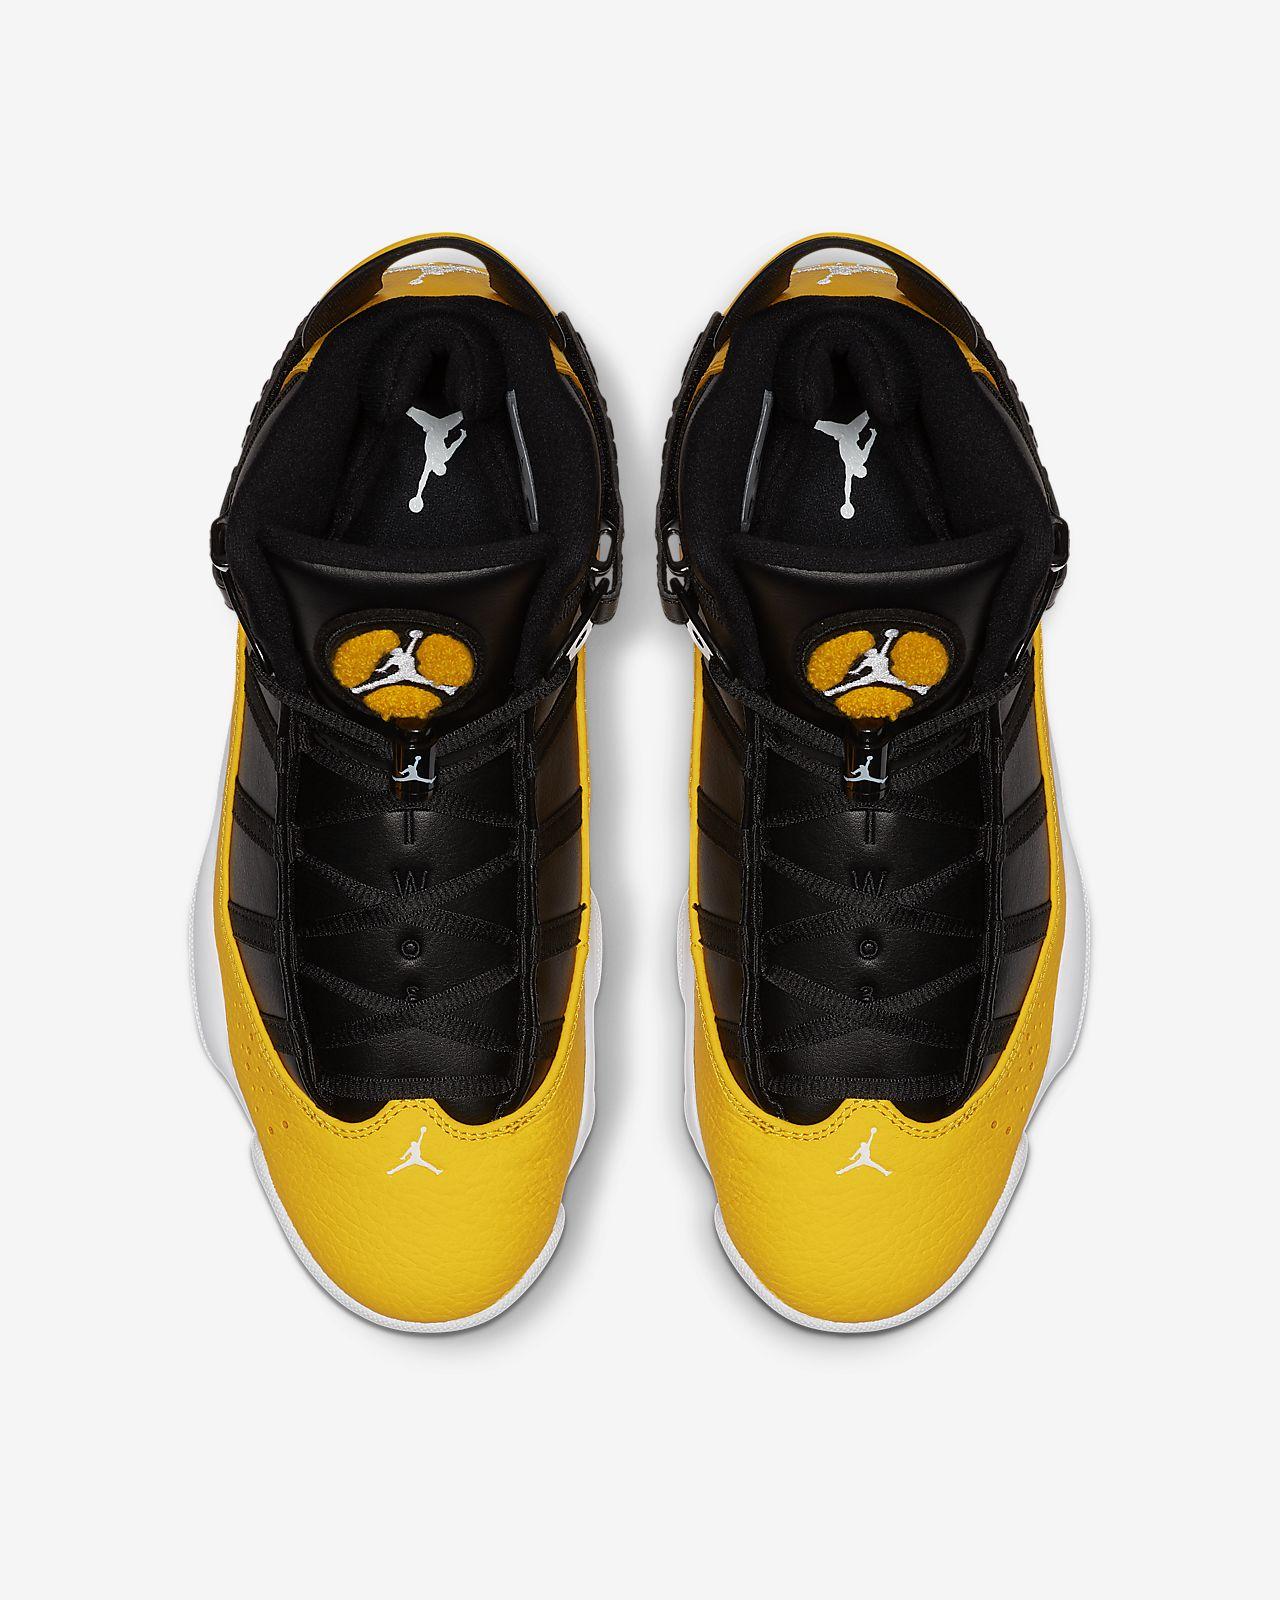 outlet store 49606 d62b1 ... Chaussure Jordan 6 Rings pour Homme